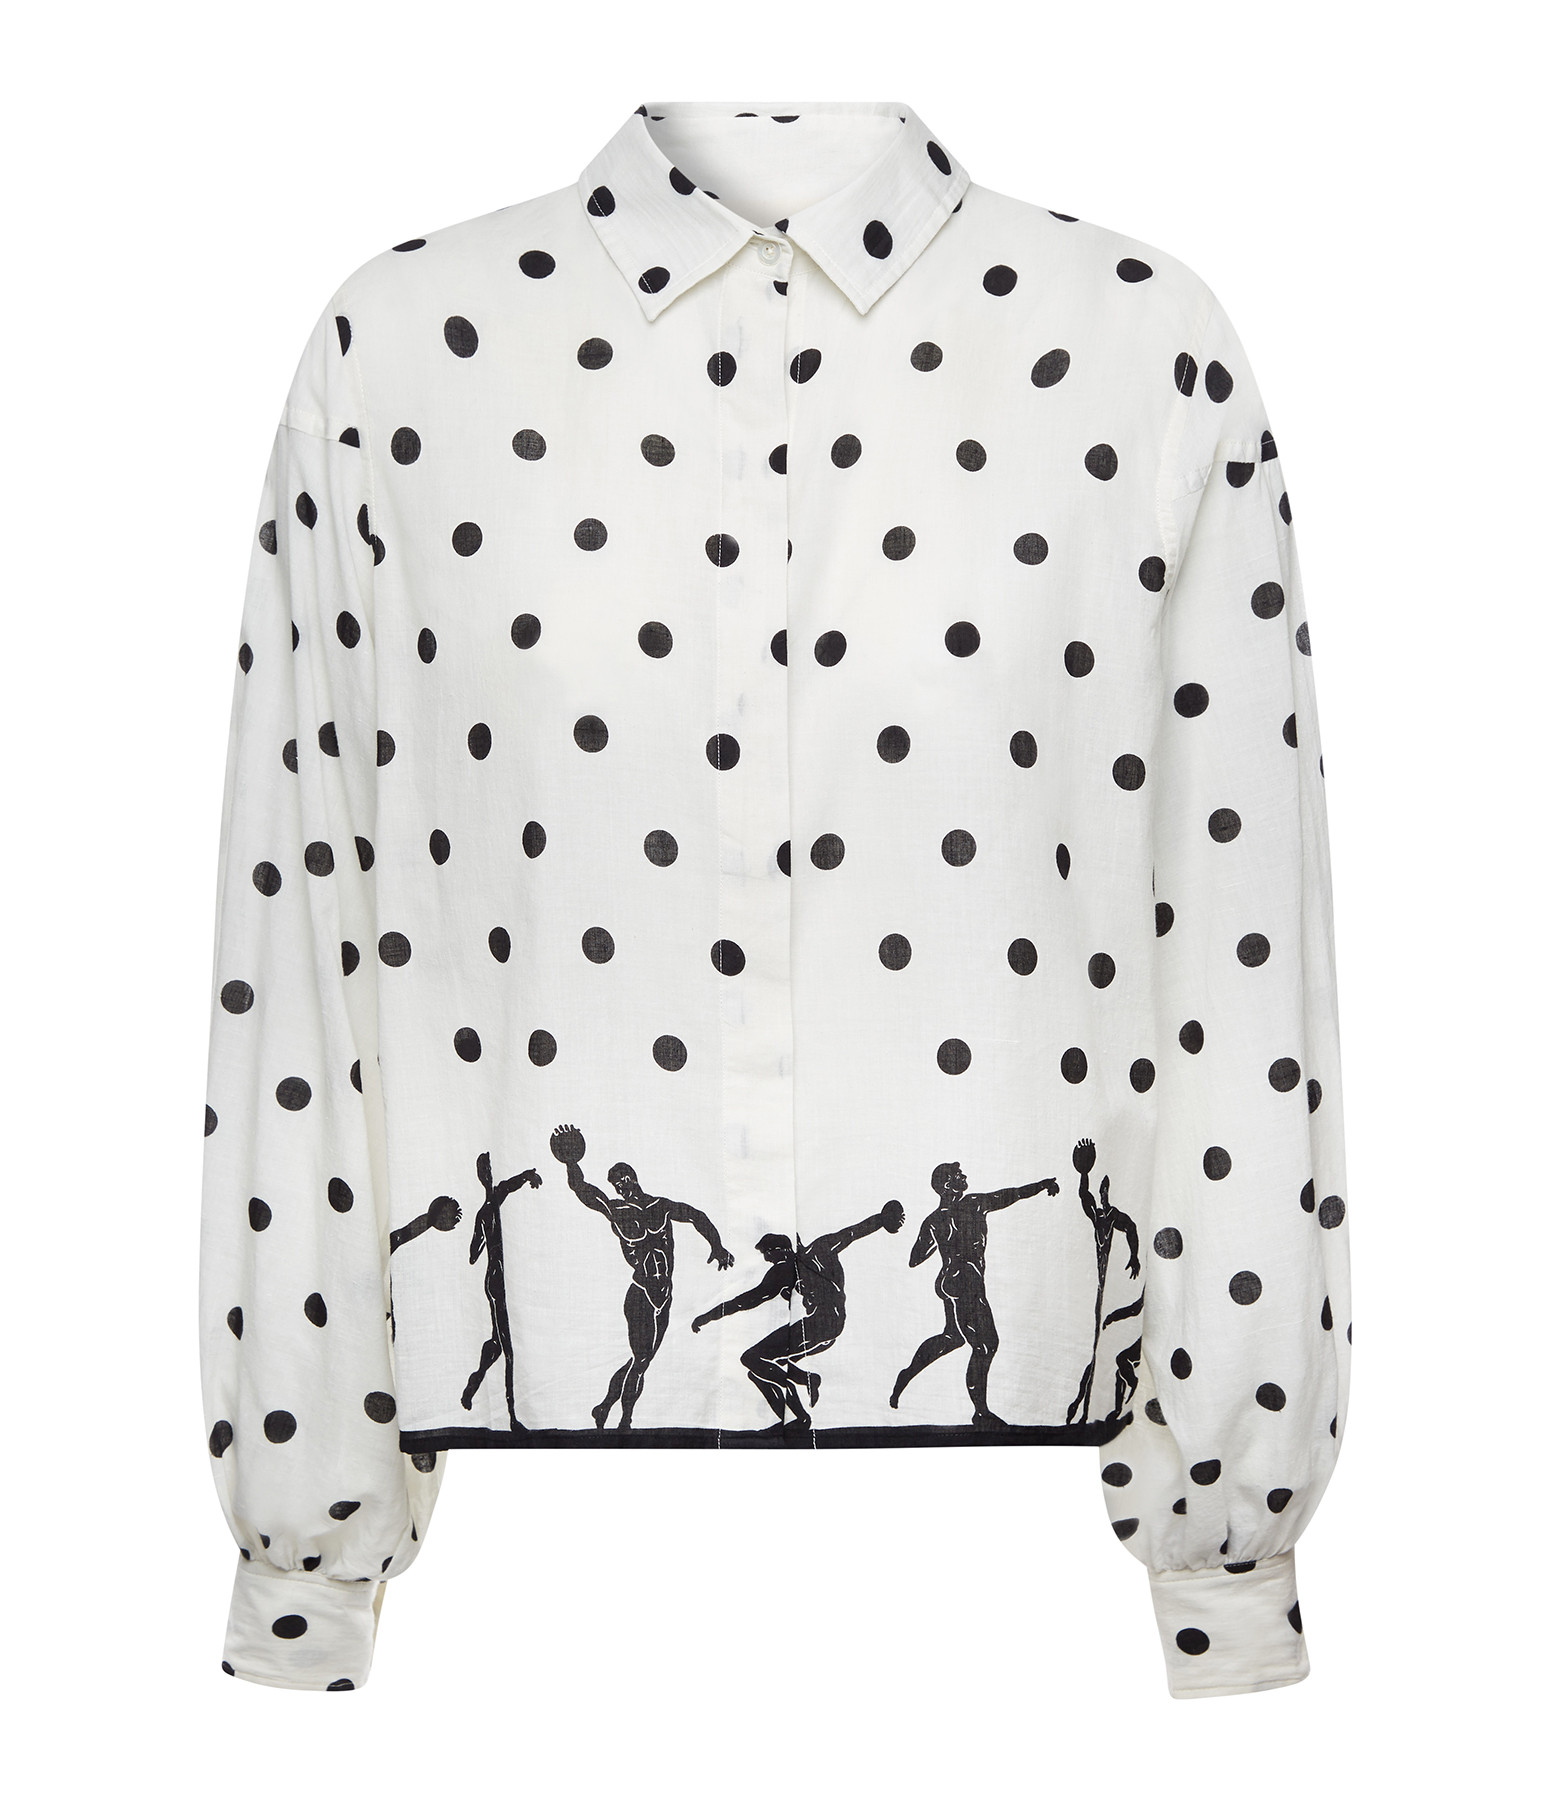 MII - Chemise Pois Coton Noir Blanc